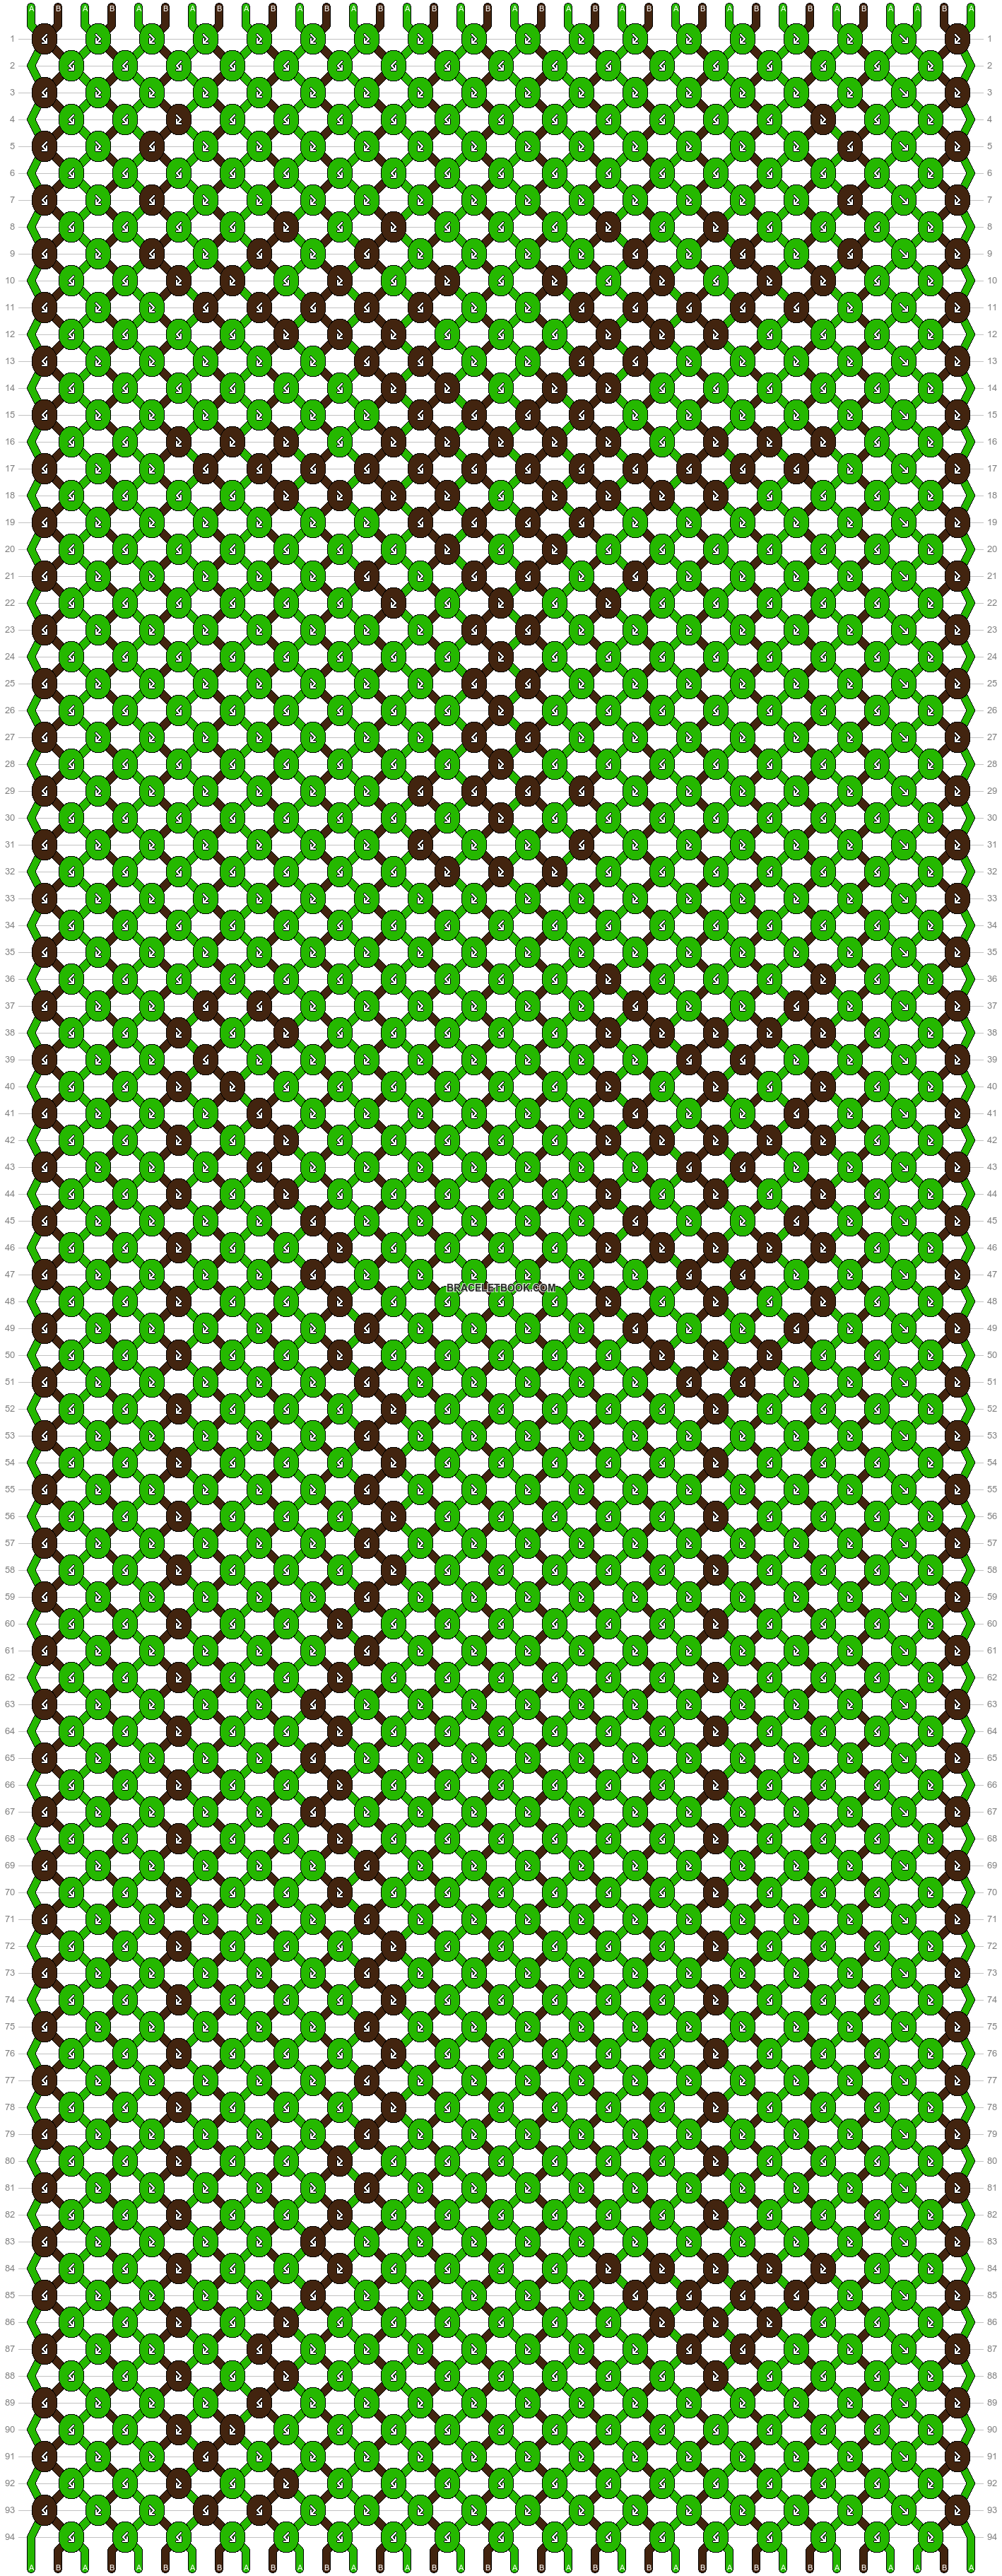 Normal Pattern #21758 added by ValkyrieL